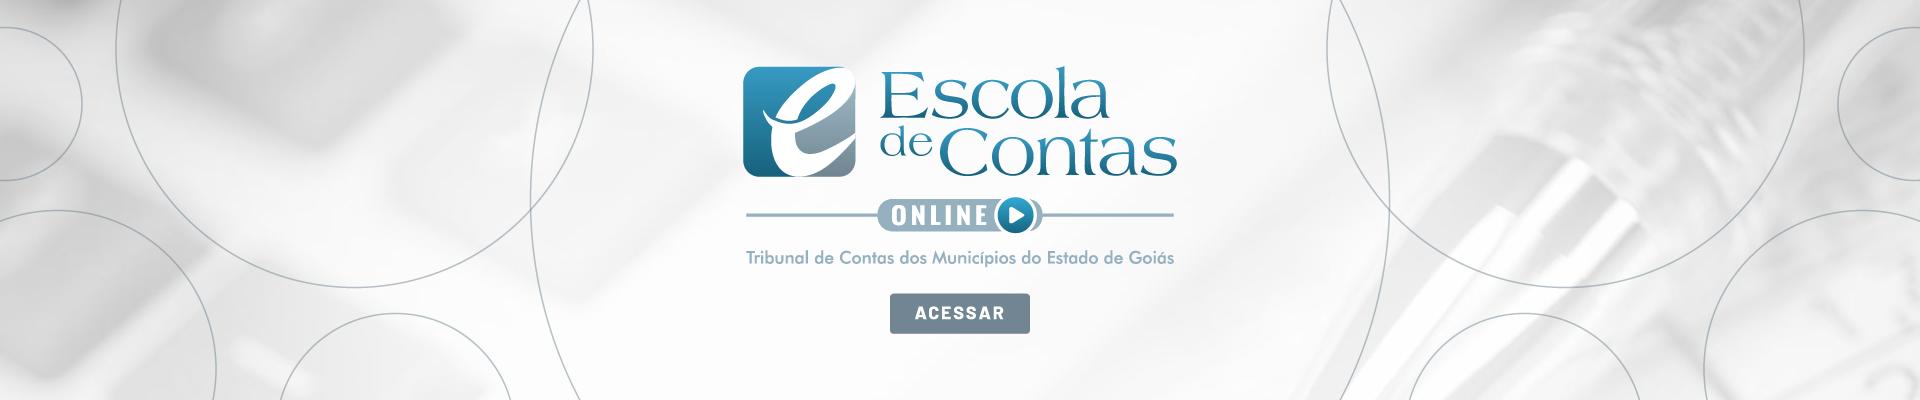 Escola de Contas Online do Tribunal de Contas dos Municípios do Estado de Goiás